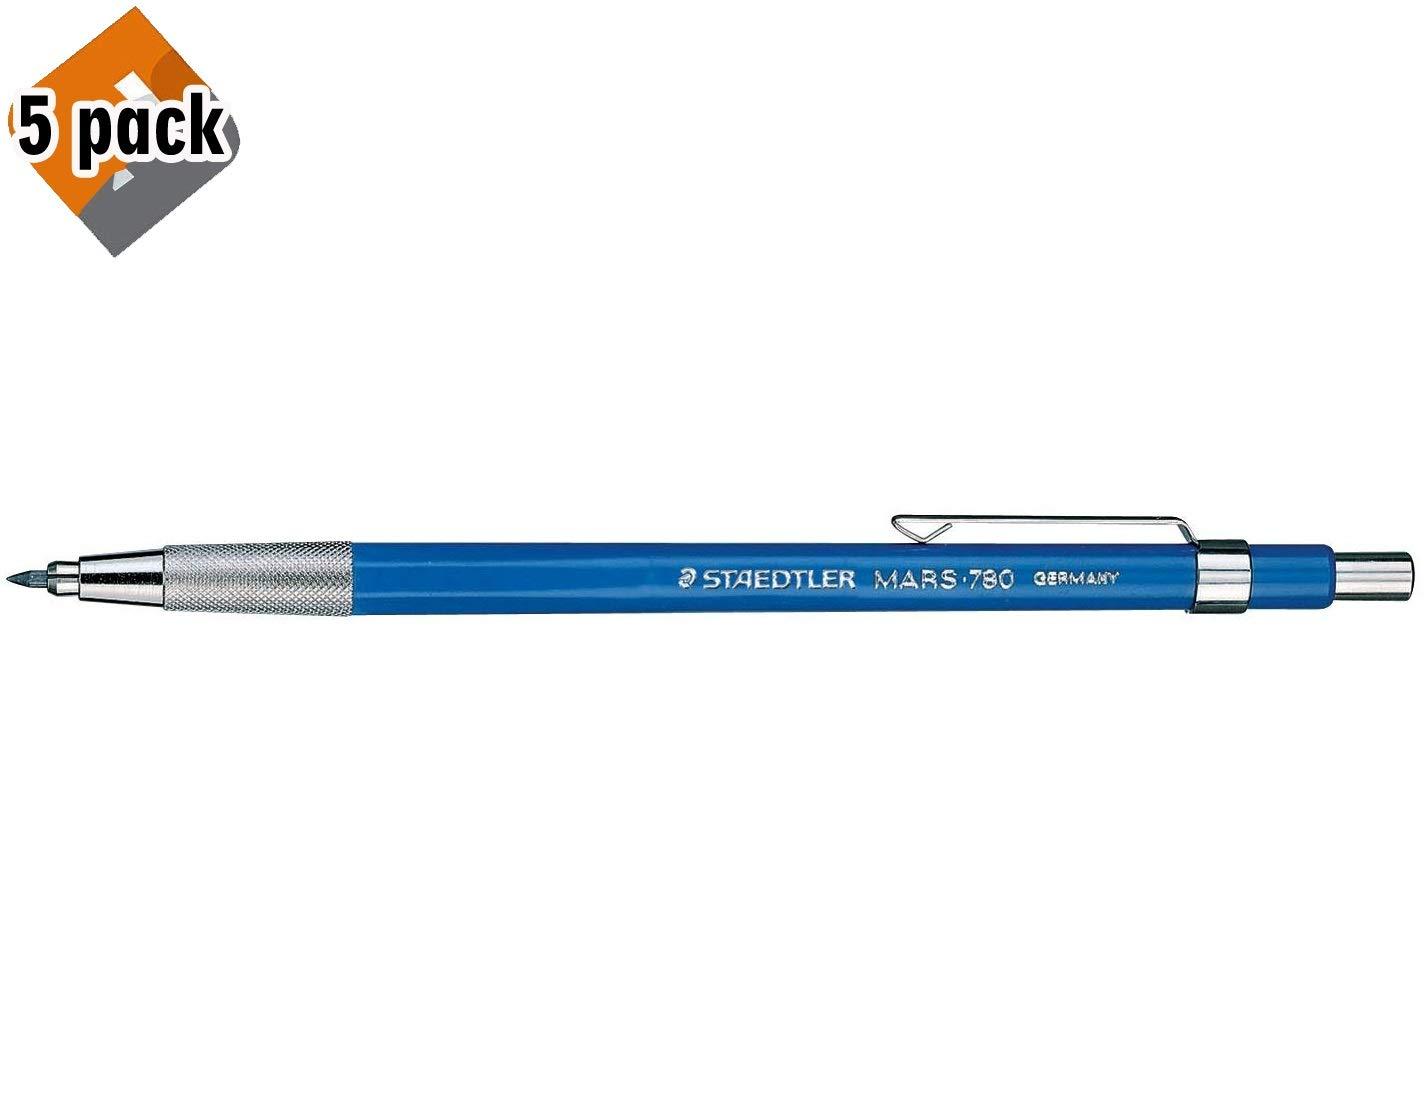 STAEDTLER Mars 780 Technical Mechanical Pencil, 2mm. 780BK 5 Pack by STAEDTLER